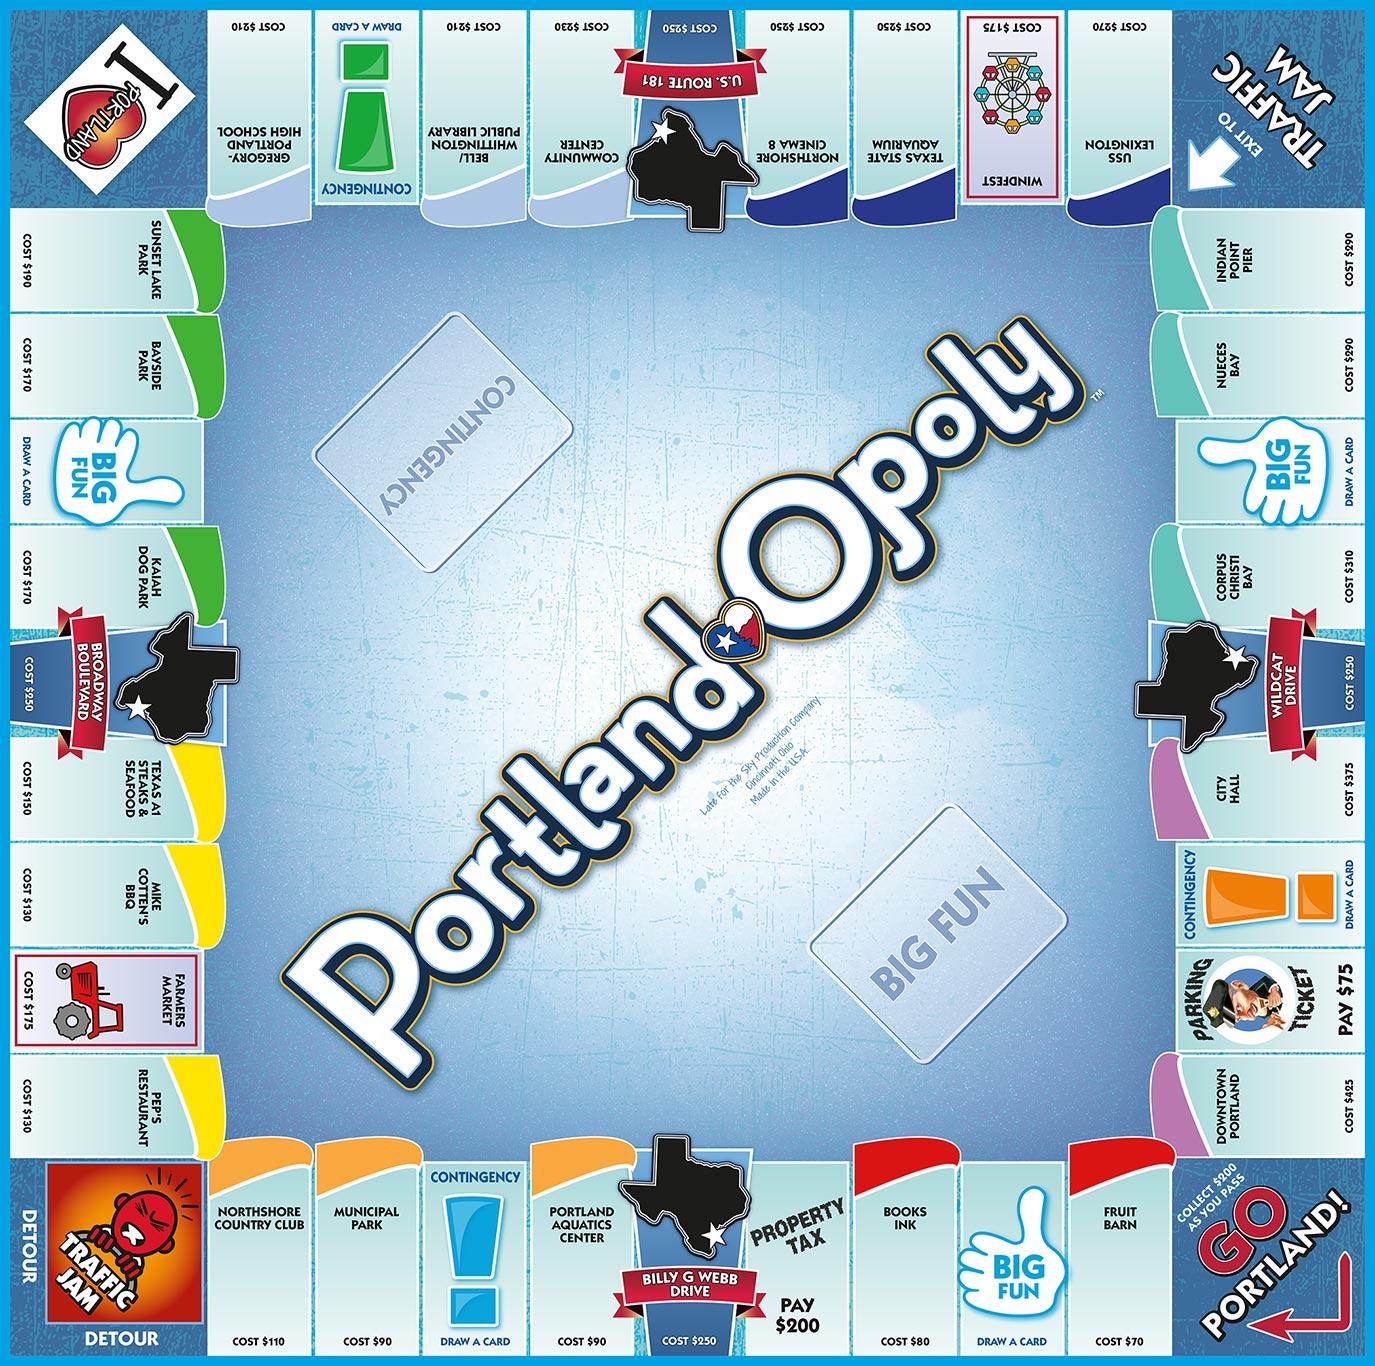 PORTLAND-OPOLY, TX Board Game